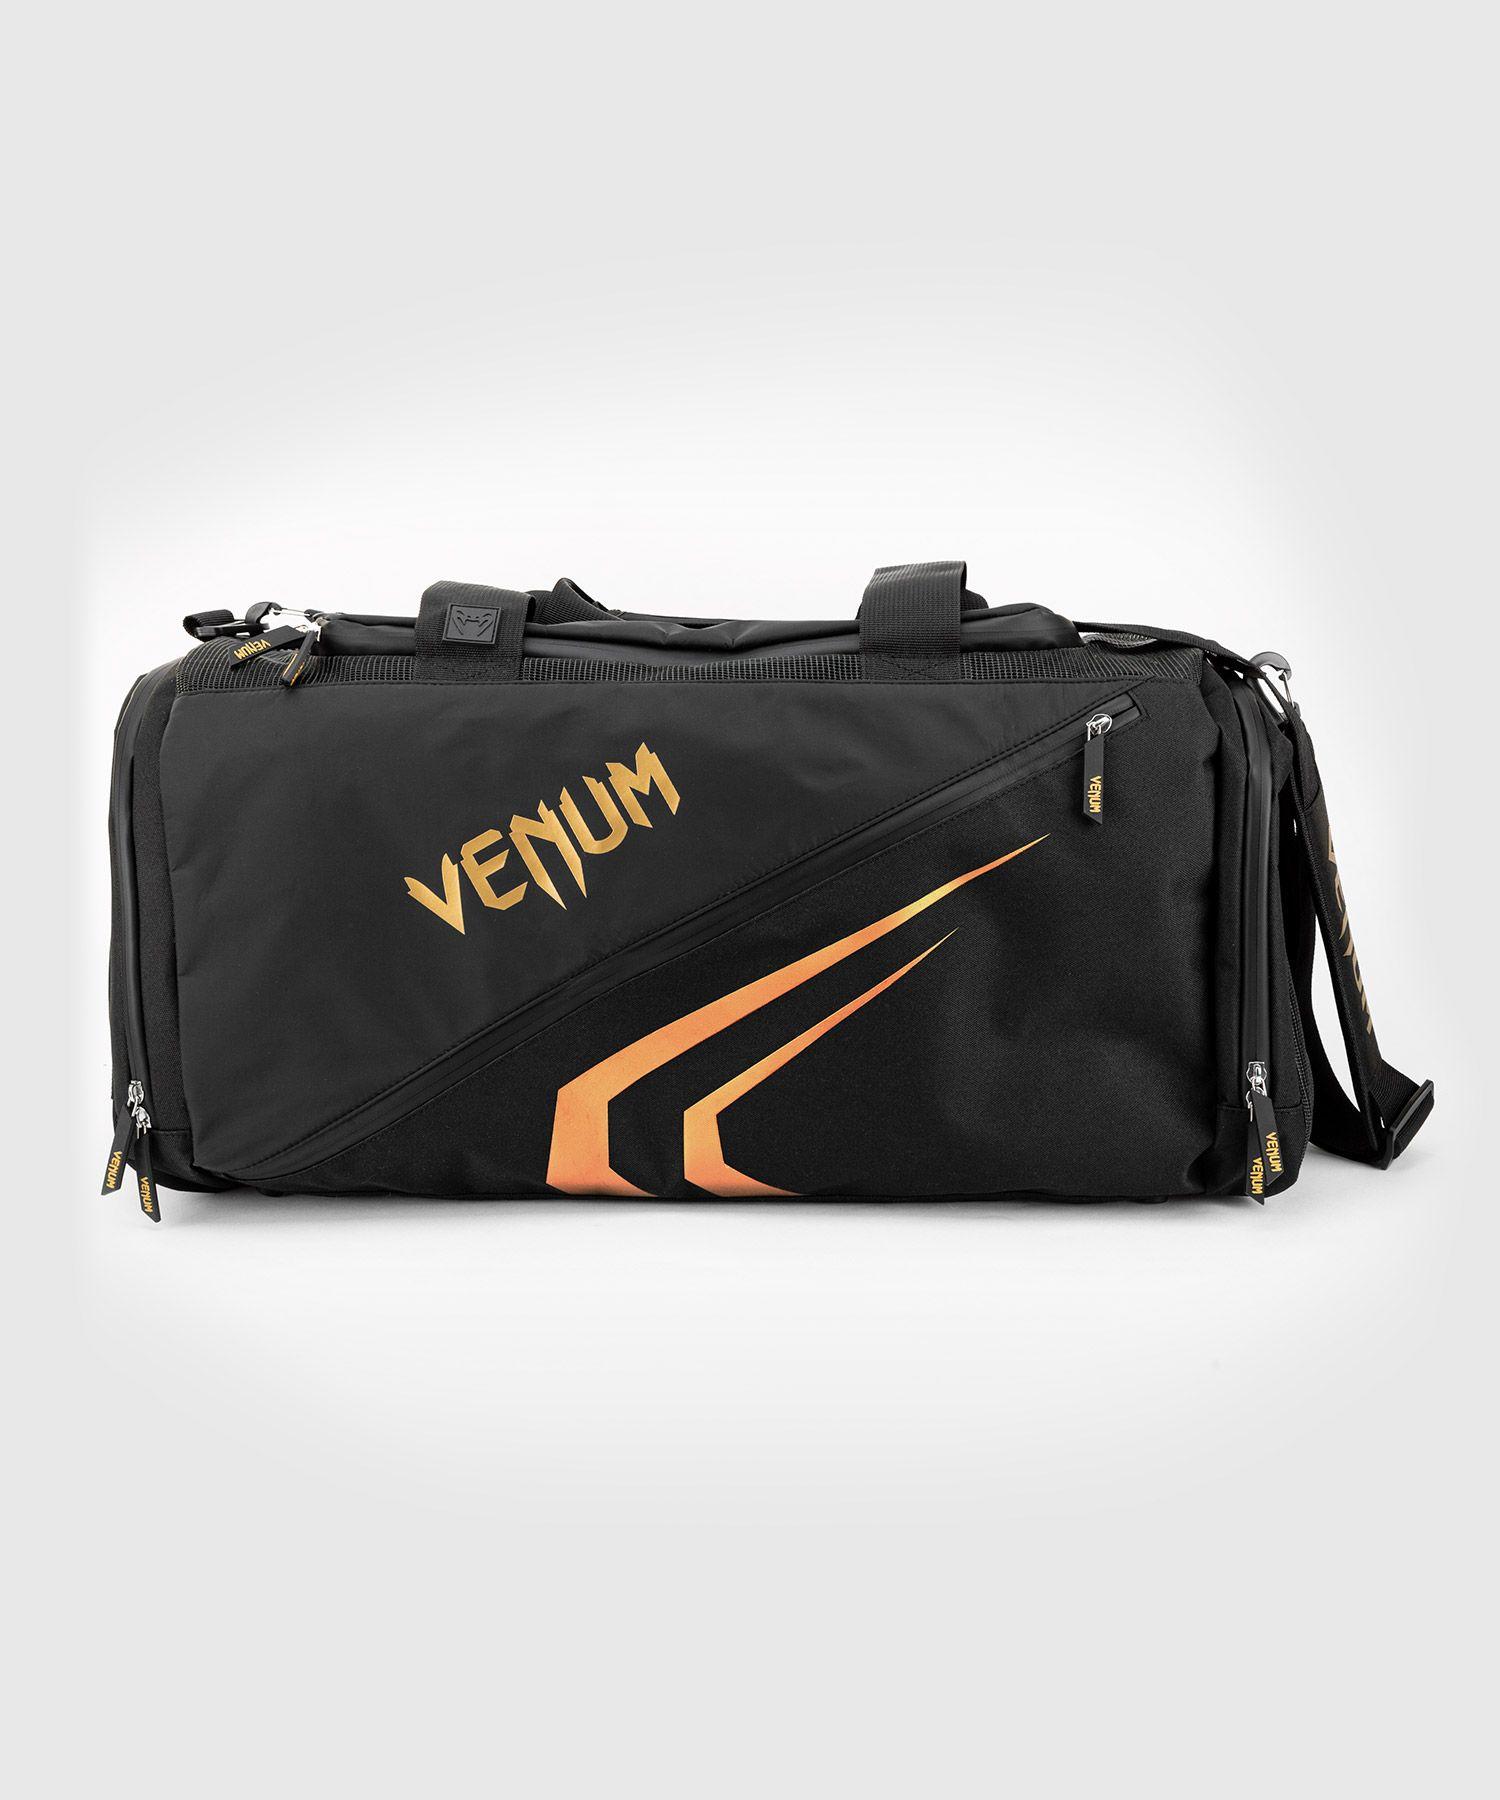 Sac de sport Venum Trainer lite EVO